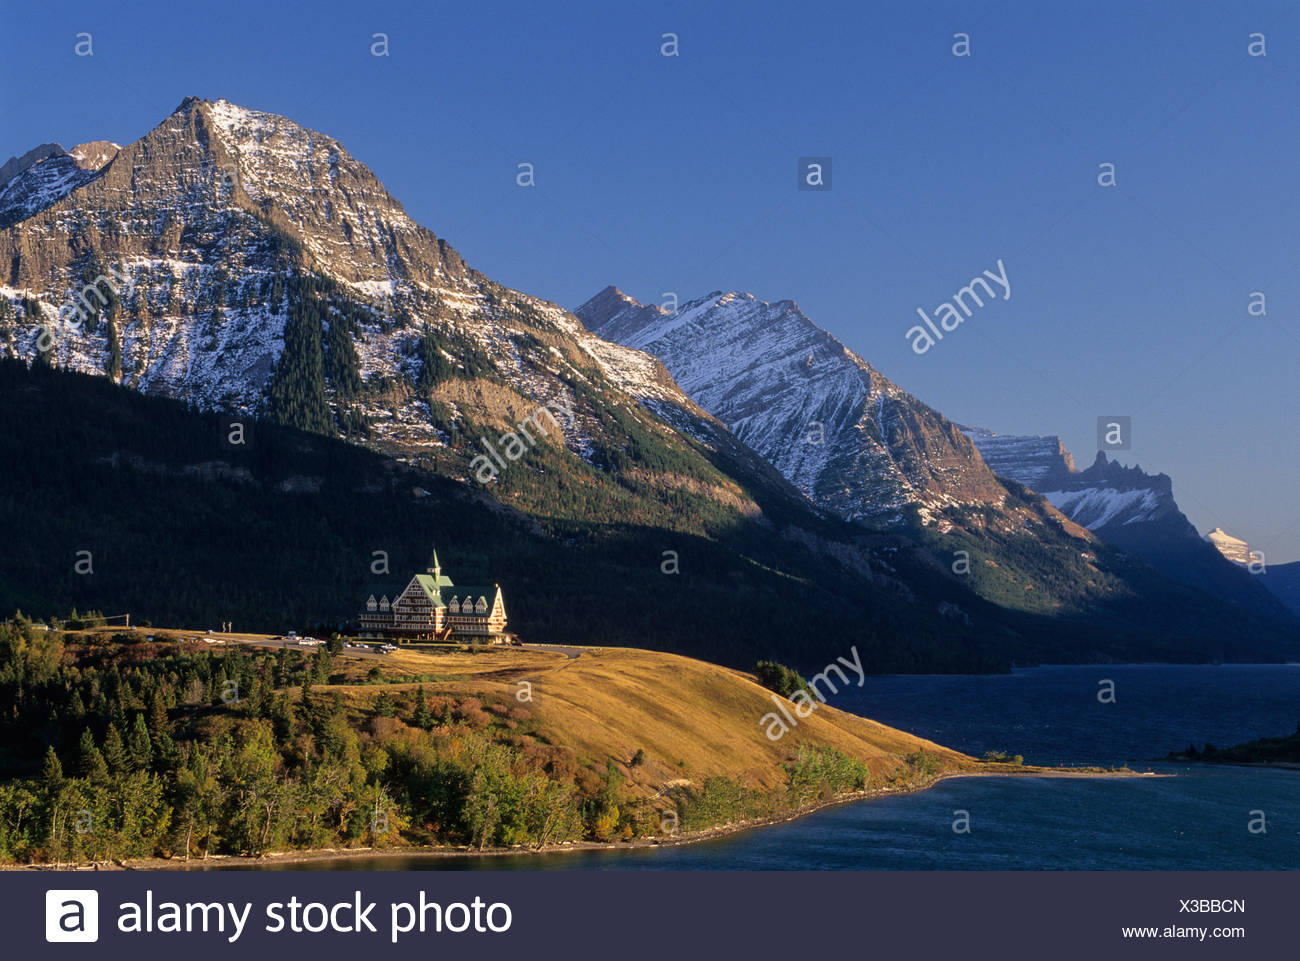 Sunrise, Prince of Wales Hotel, Waterton-Glacier International Peace Park, Alberta, Canada. Stock Photo